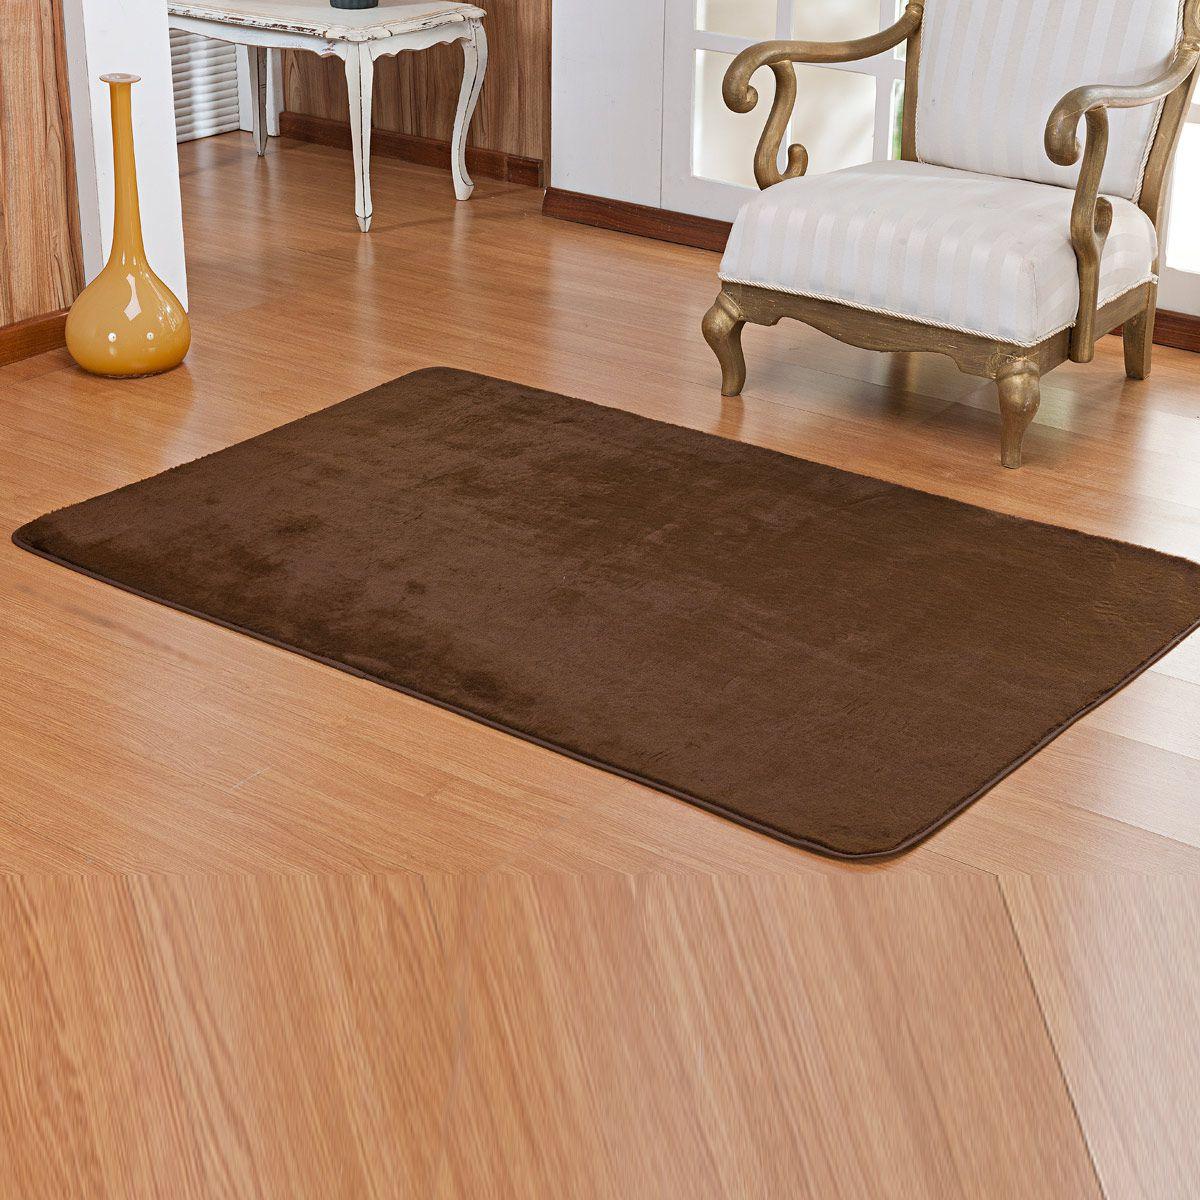 Tapete Retangular Premium p/ Sala Café Liso 1,50m x 1,00m